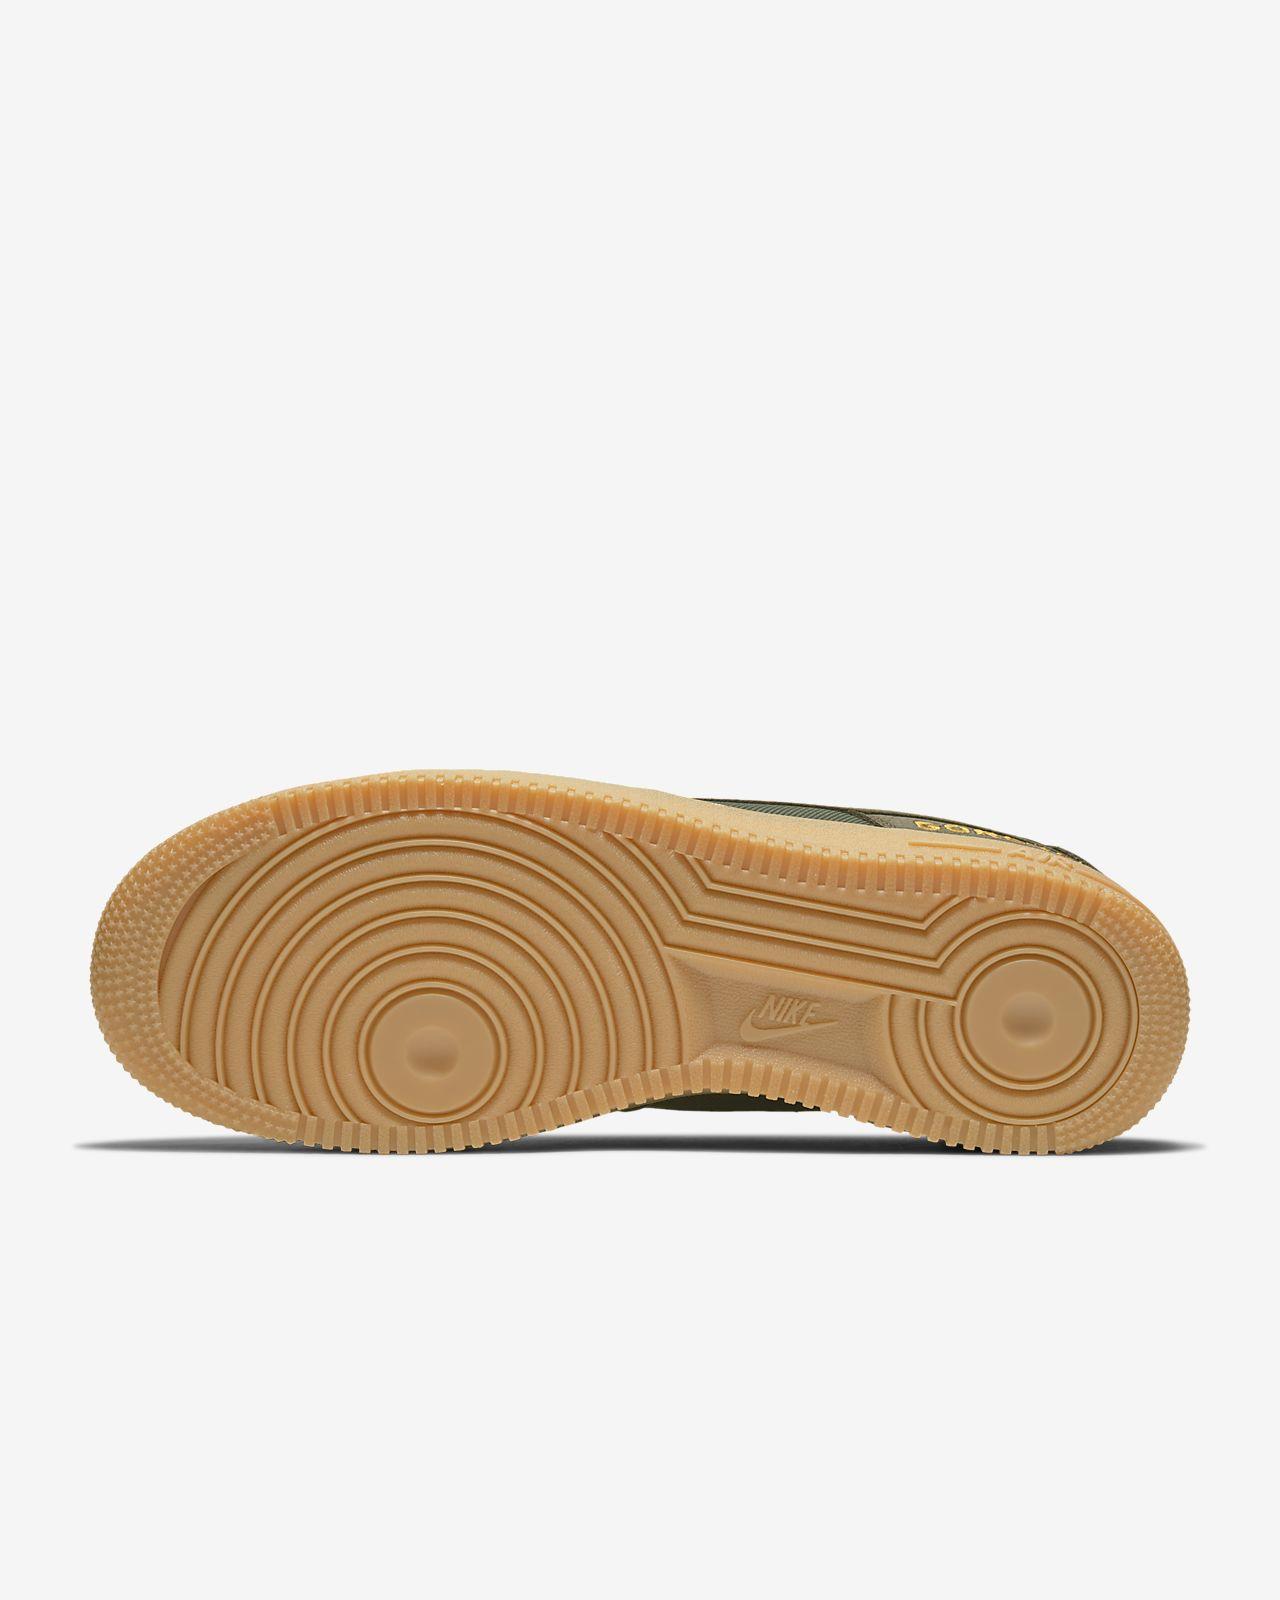 Nike Air Force 1 GORE TEX ® Shoe